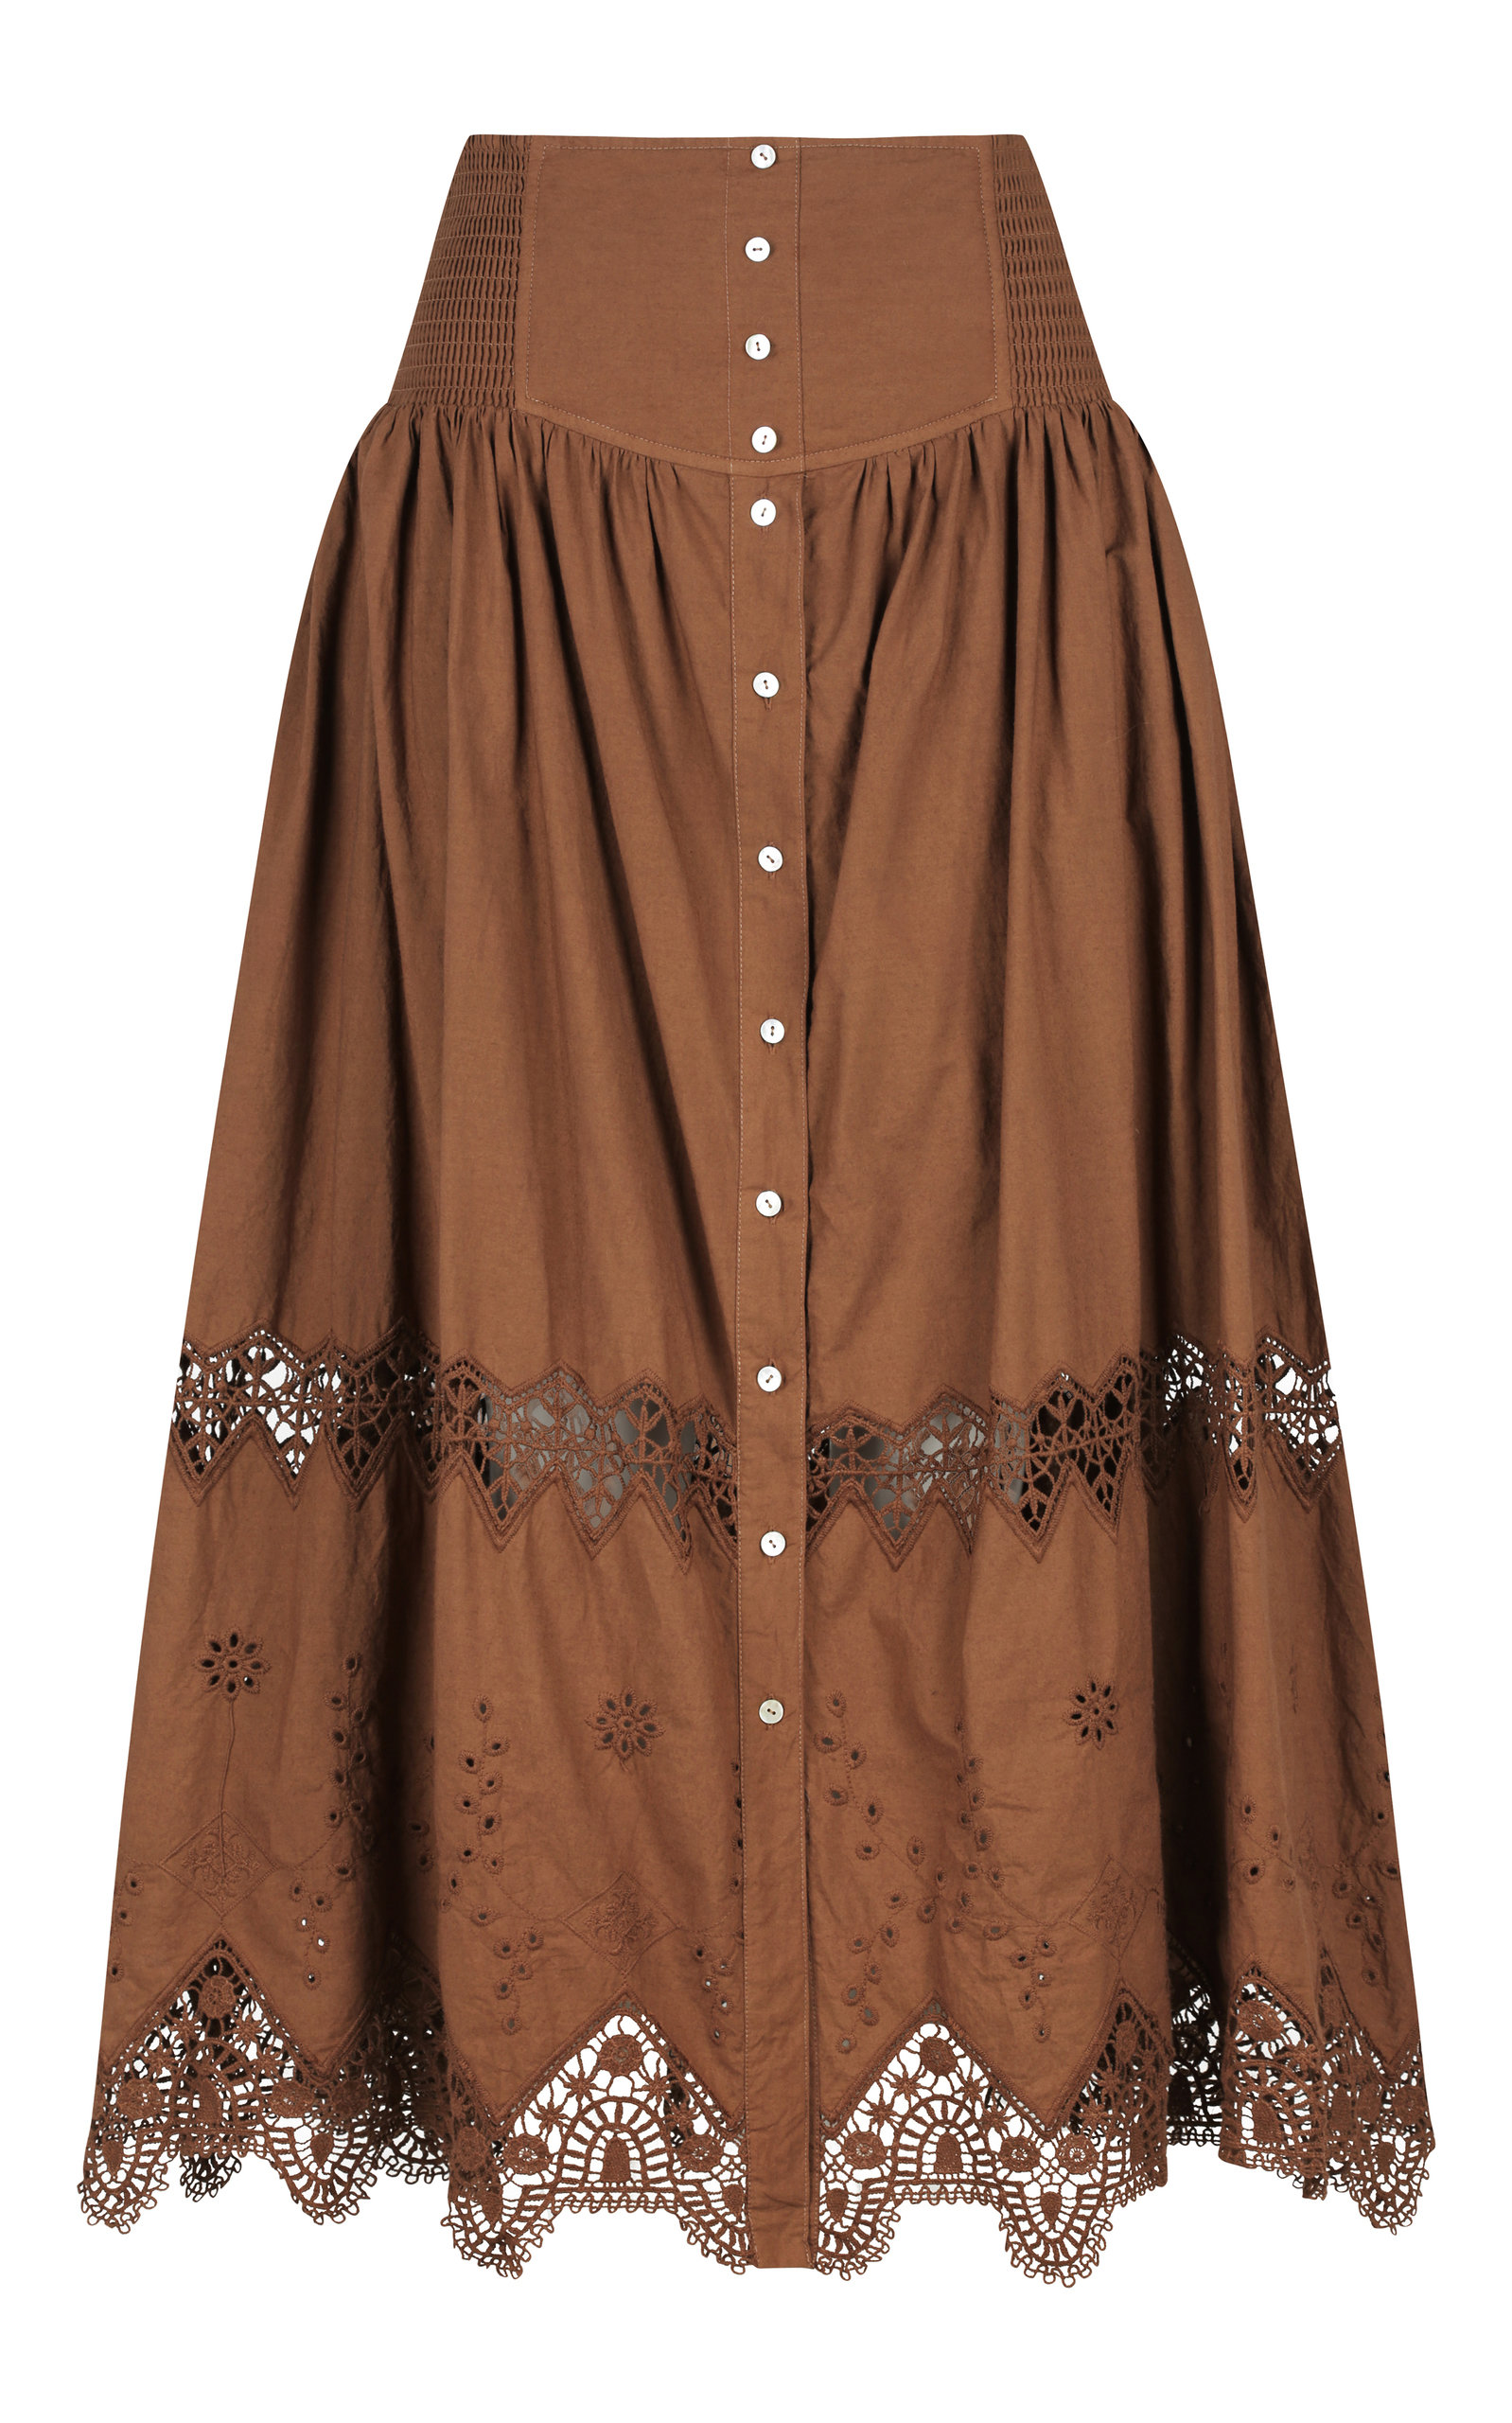 ALÉMAIS - Women's Julietta Cotton Midi Skirt - Brown - Moda Operandi